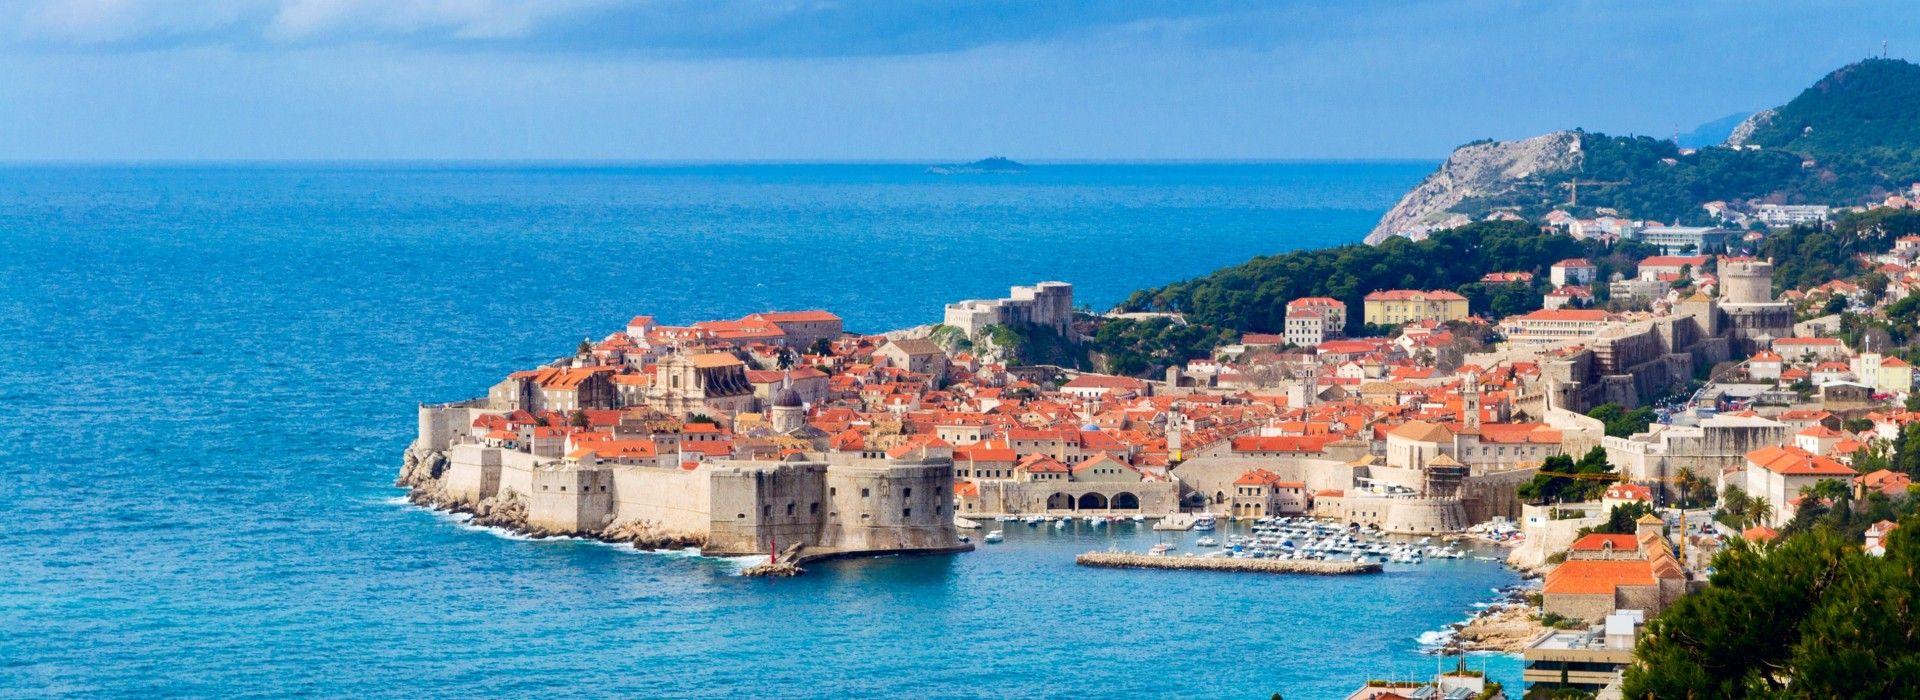 Explorer Tours in Dubrovnik